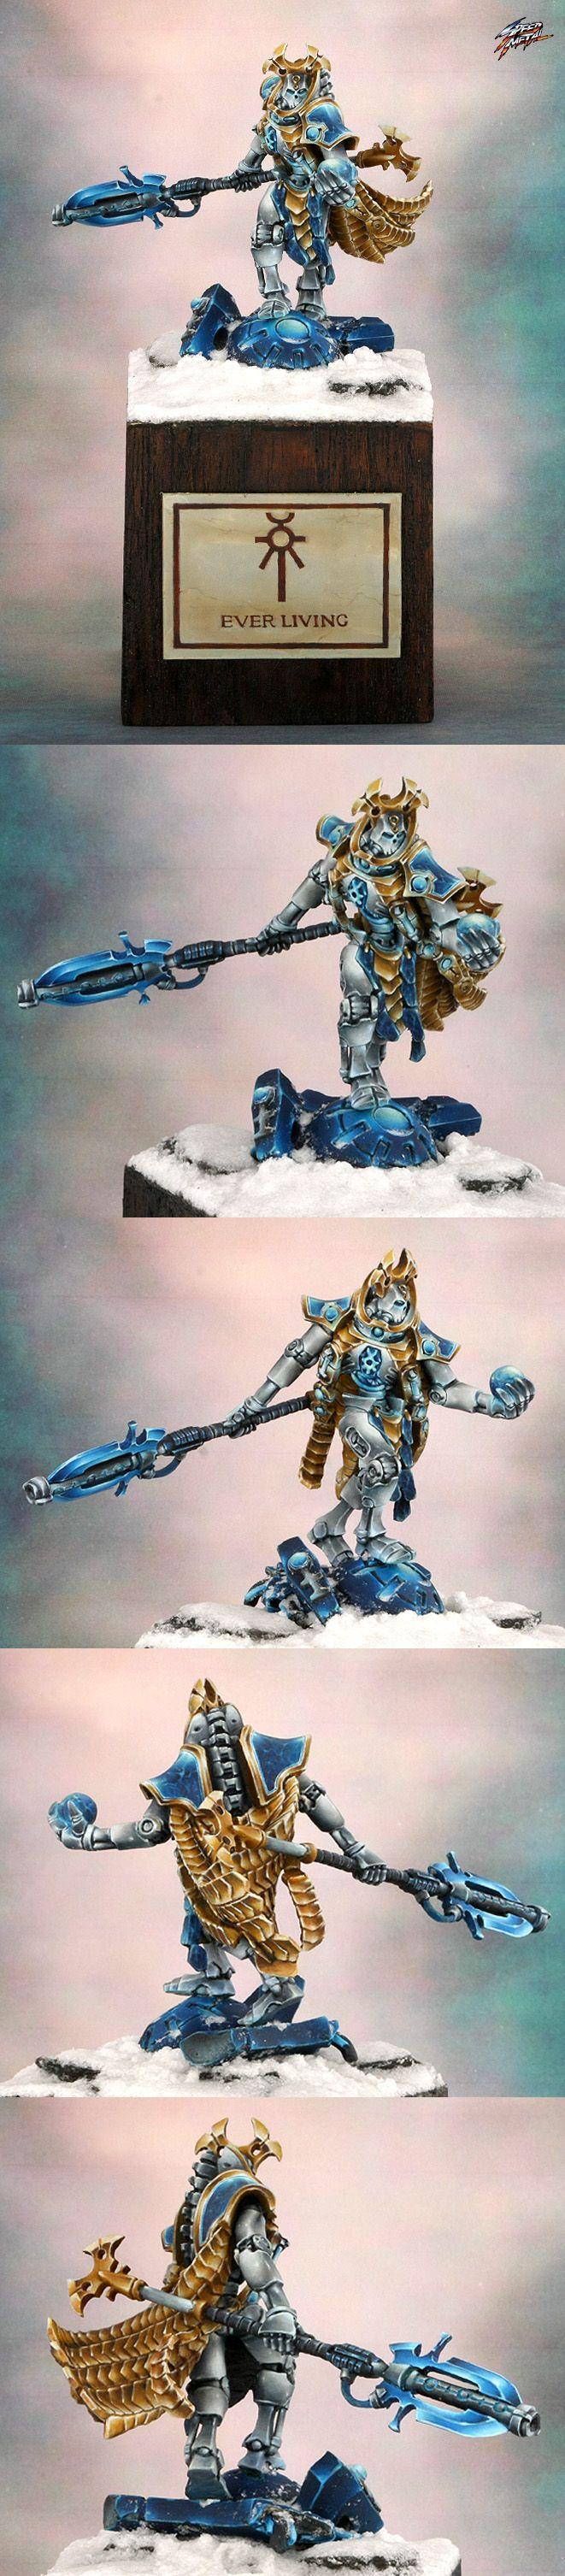 Necron Overlord - Dk suwit